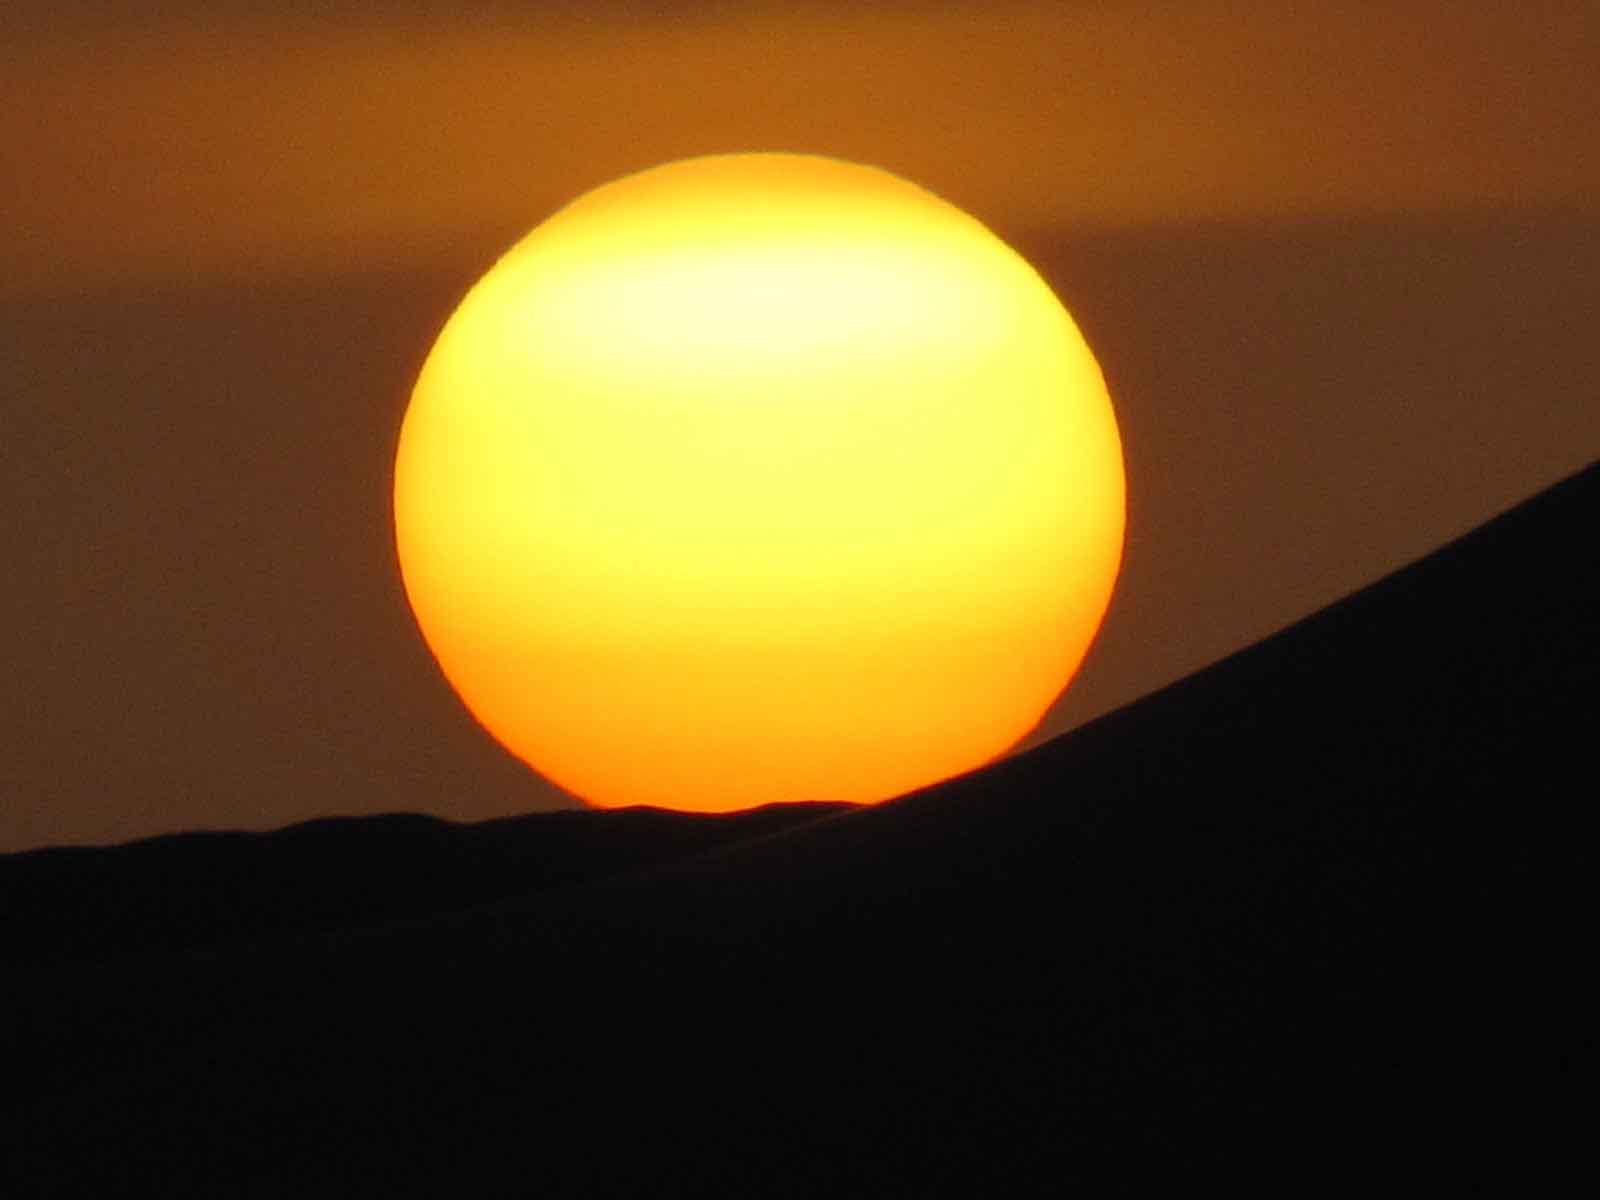 Sahara clipart desert sun #6